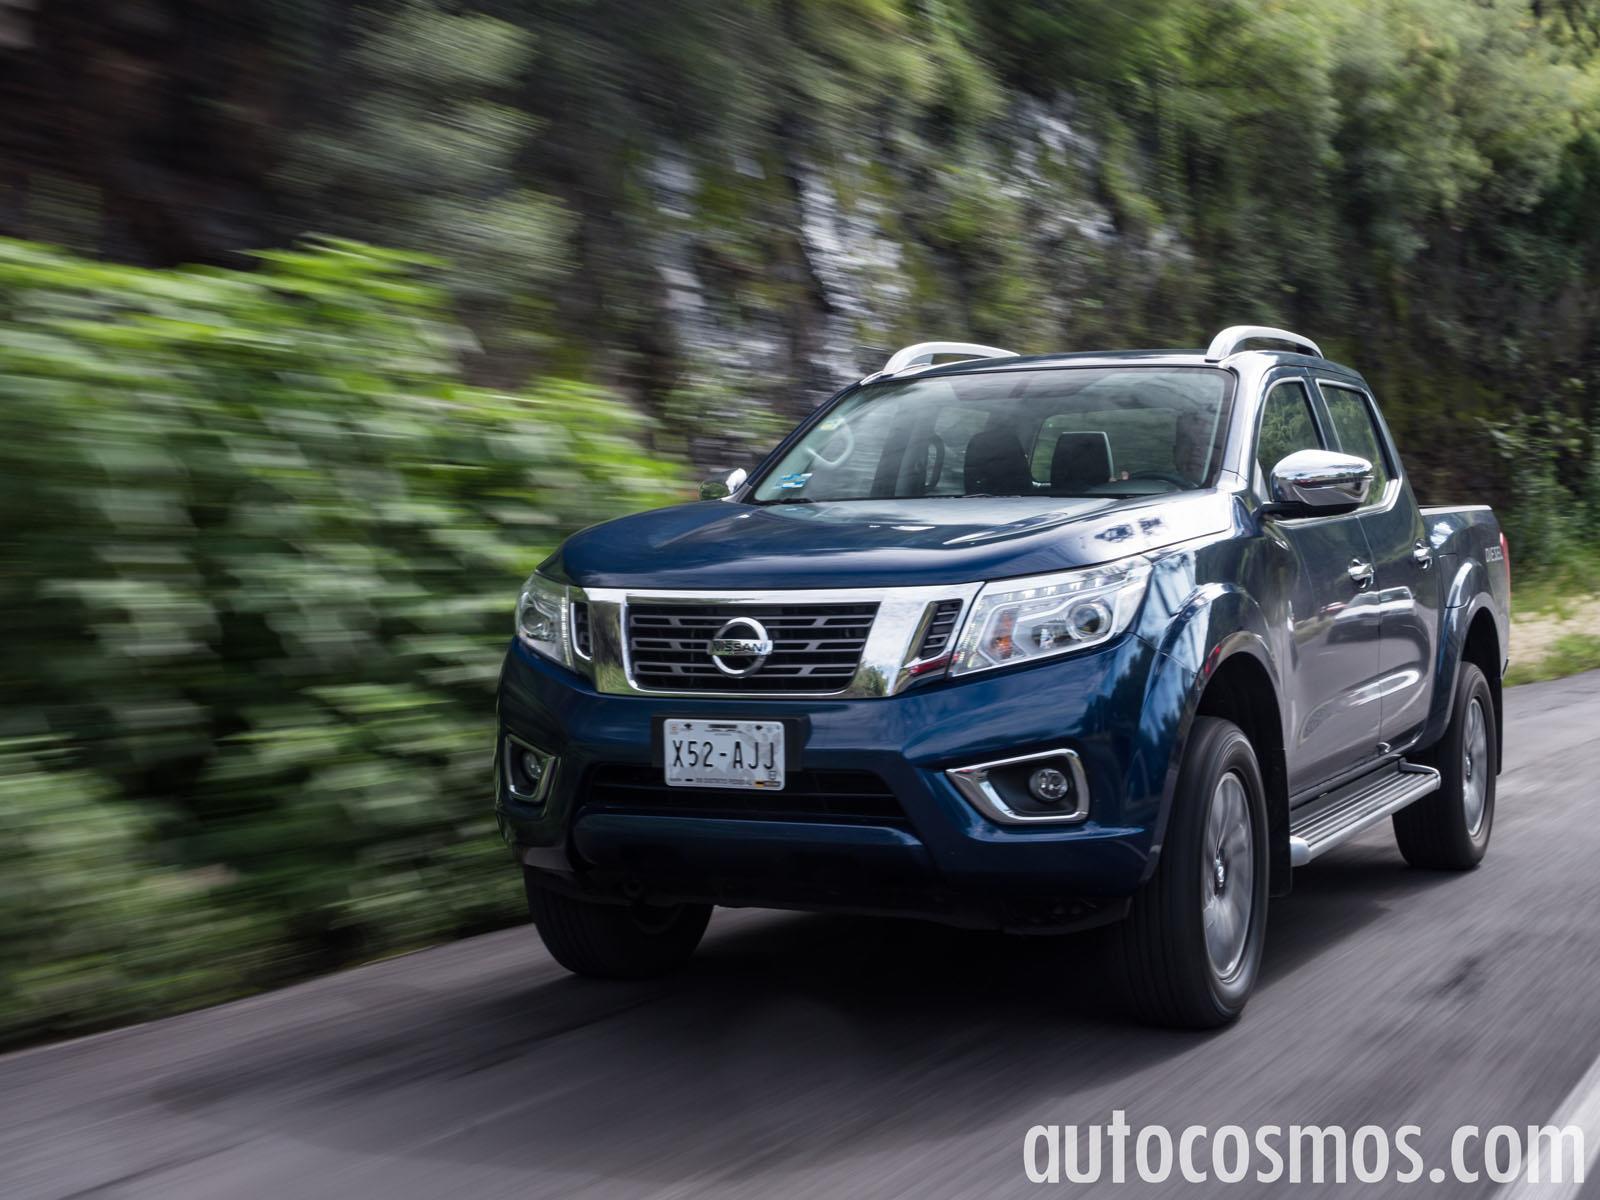 Nissan NP300 Frontier Diésel 2017 llega a México desde $284,700 pesos - Autocosmos.com